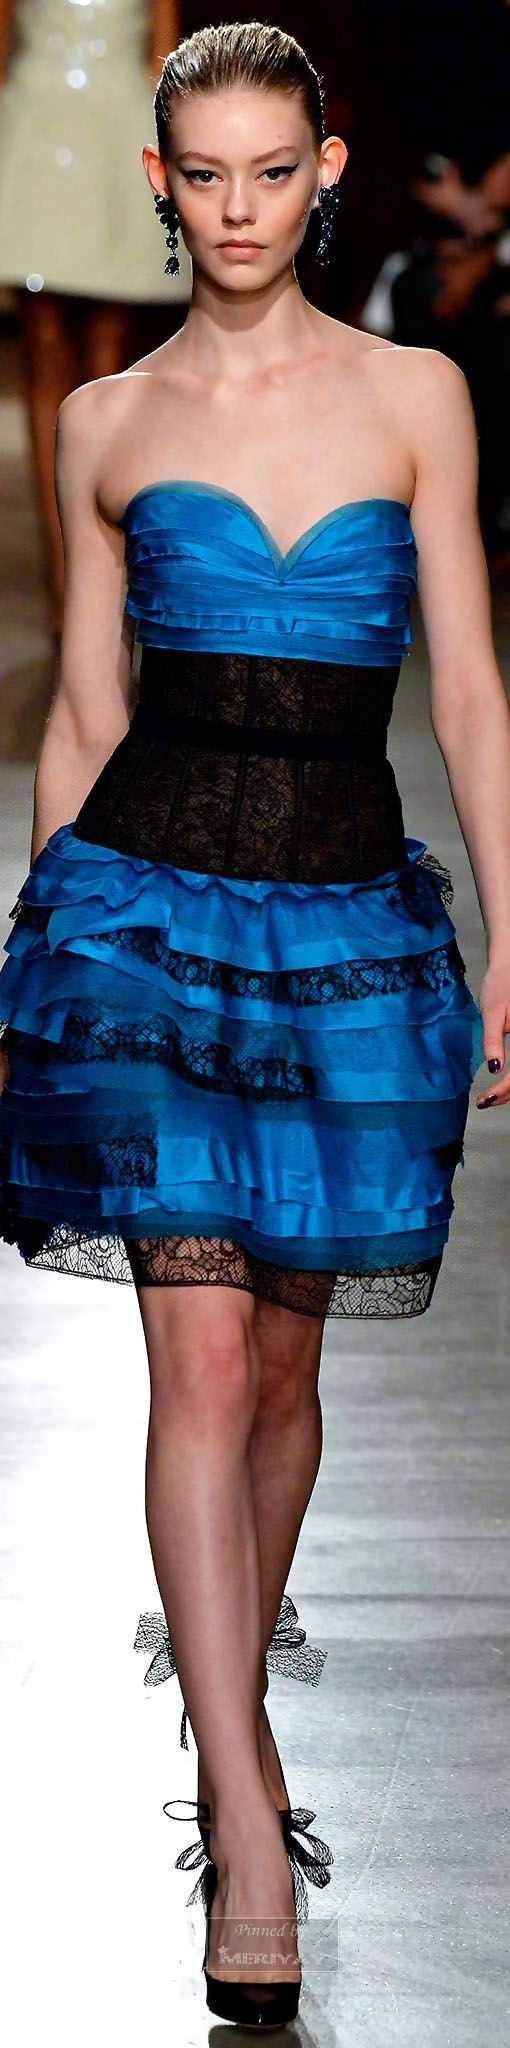 Oscar de la Renta.Fall-winter 2015-2016. If you like this item, please visit http://www.shopprice.com.au/party+gowns